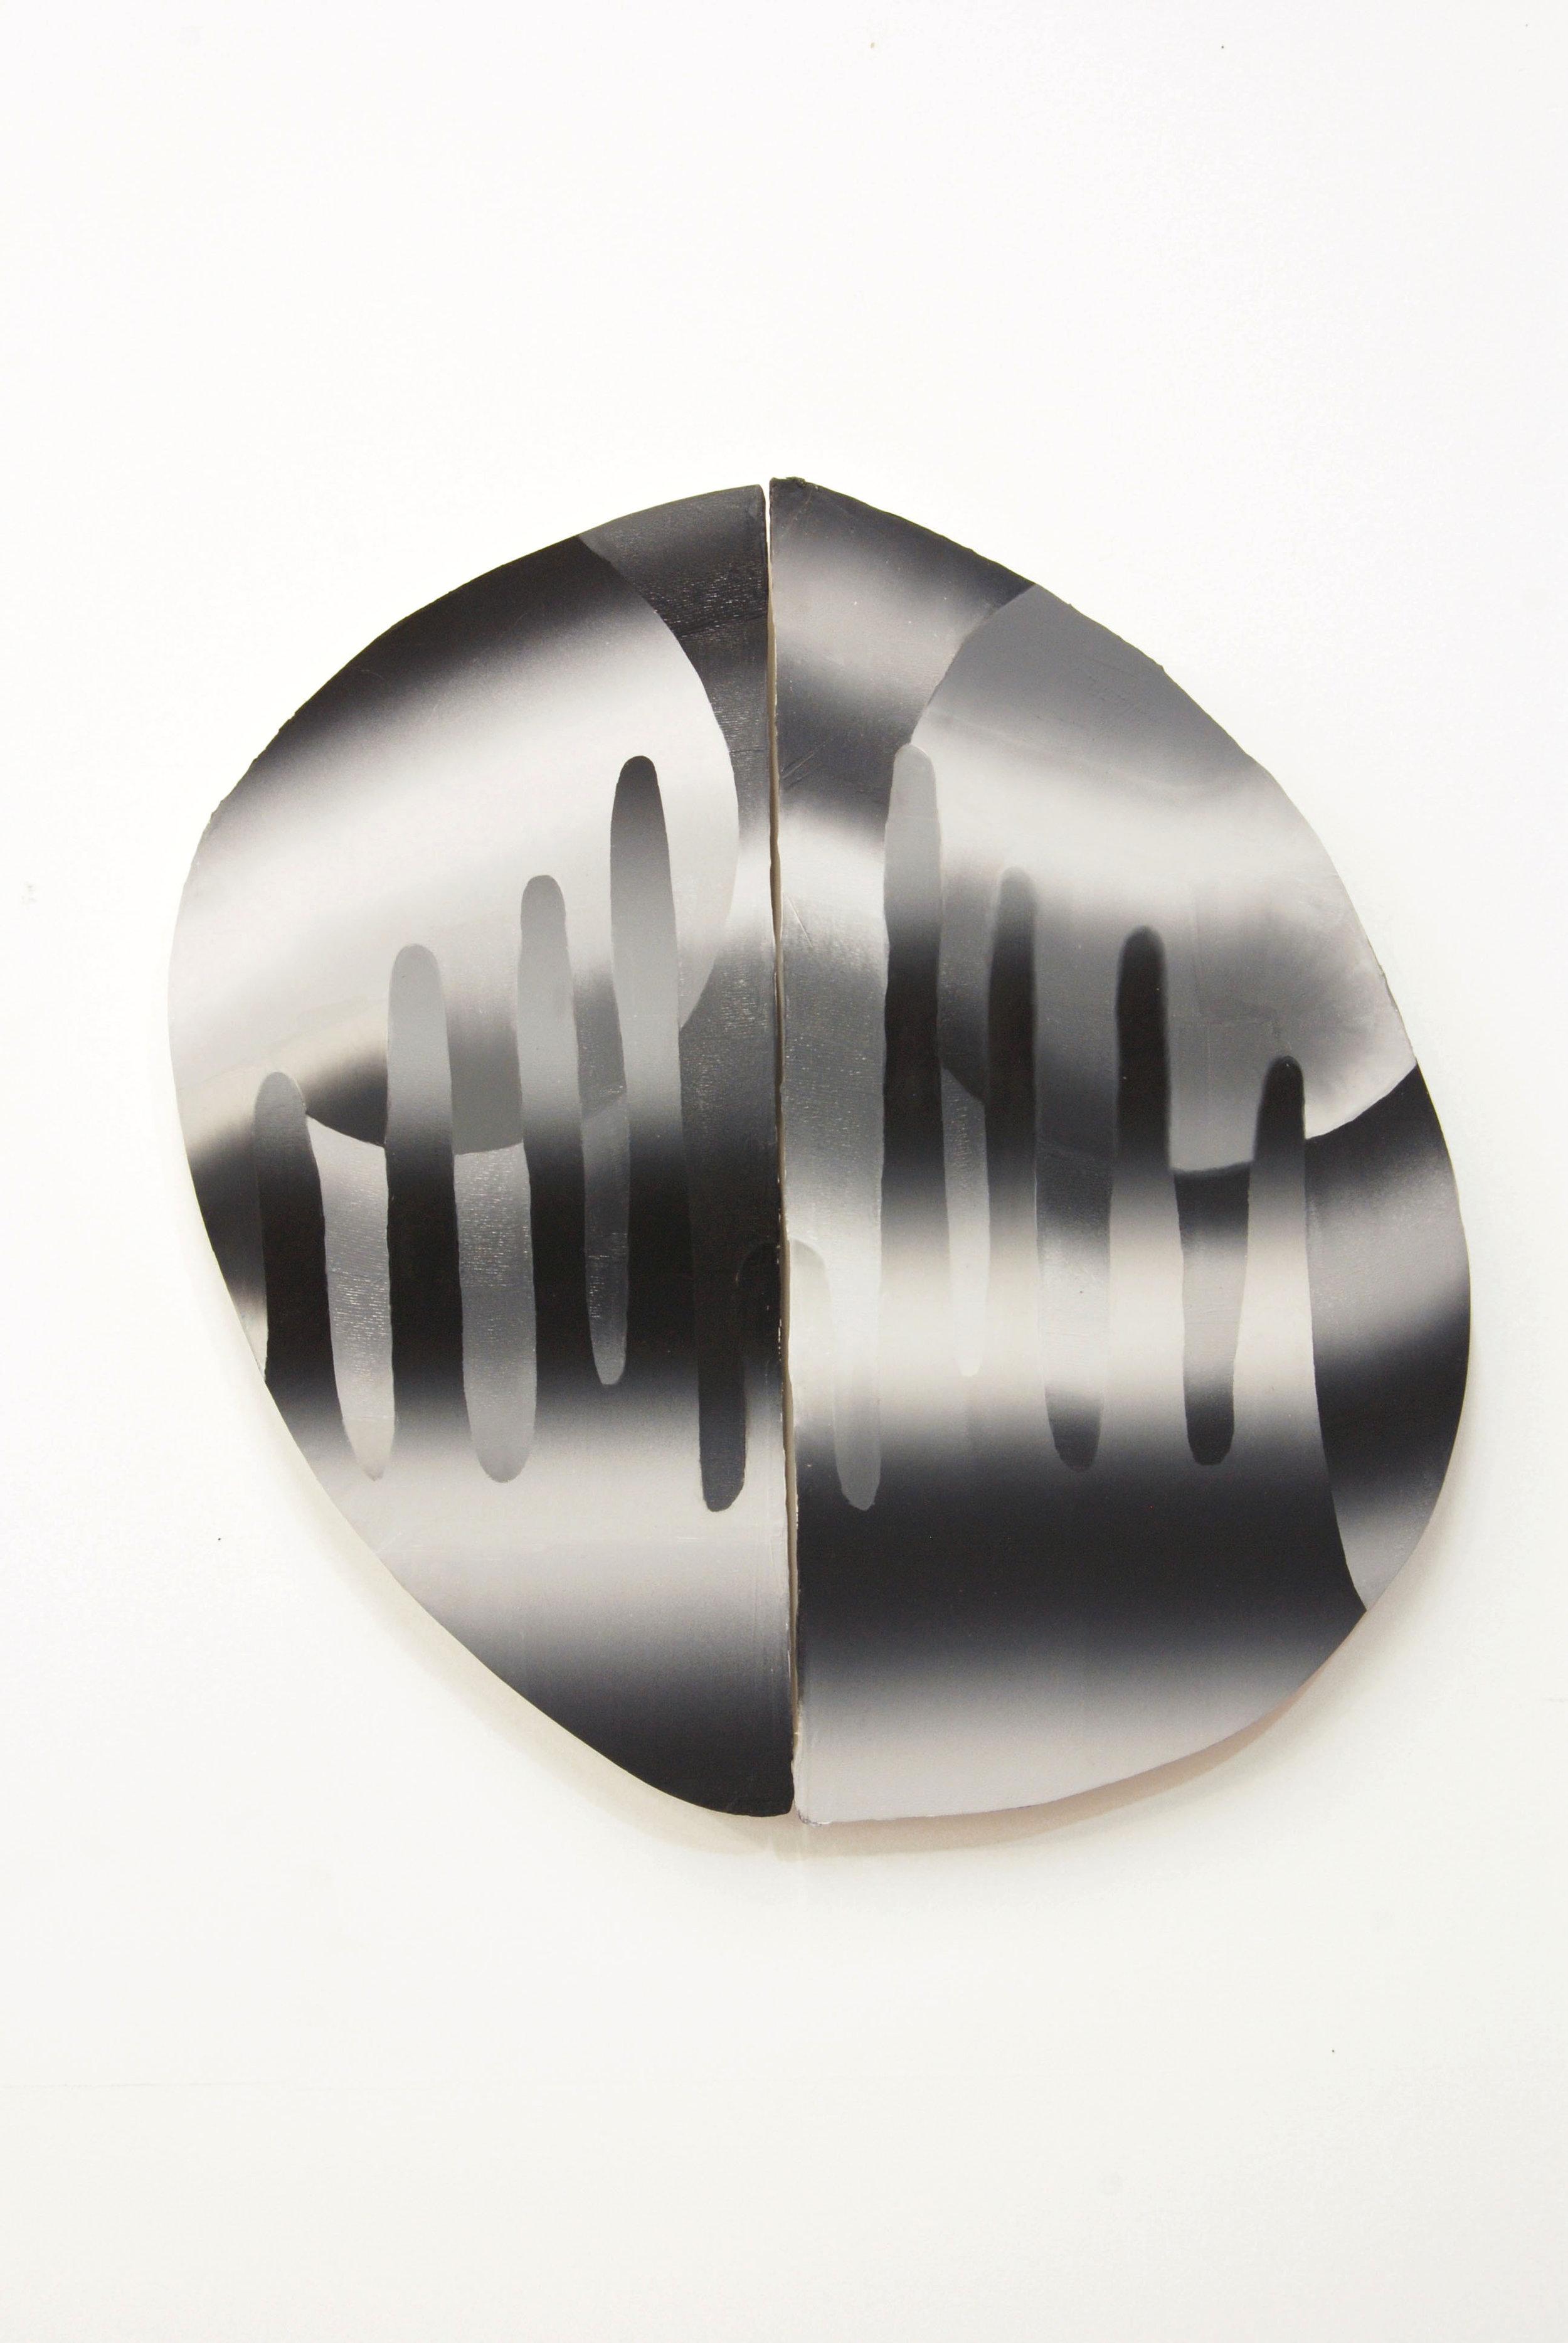 "Far Feelings, oil on shaped panels, 21"" x 21"", 2015."